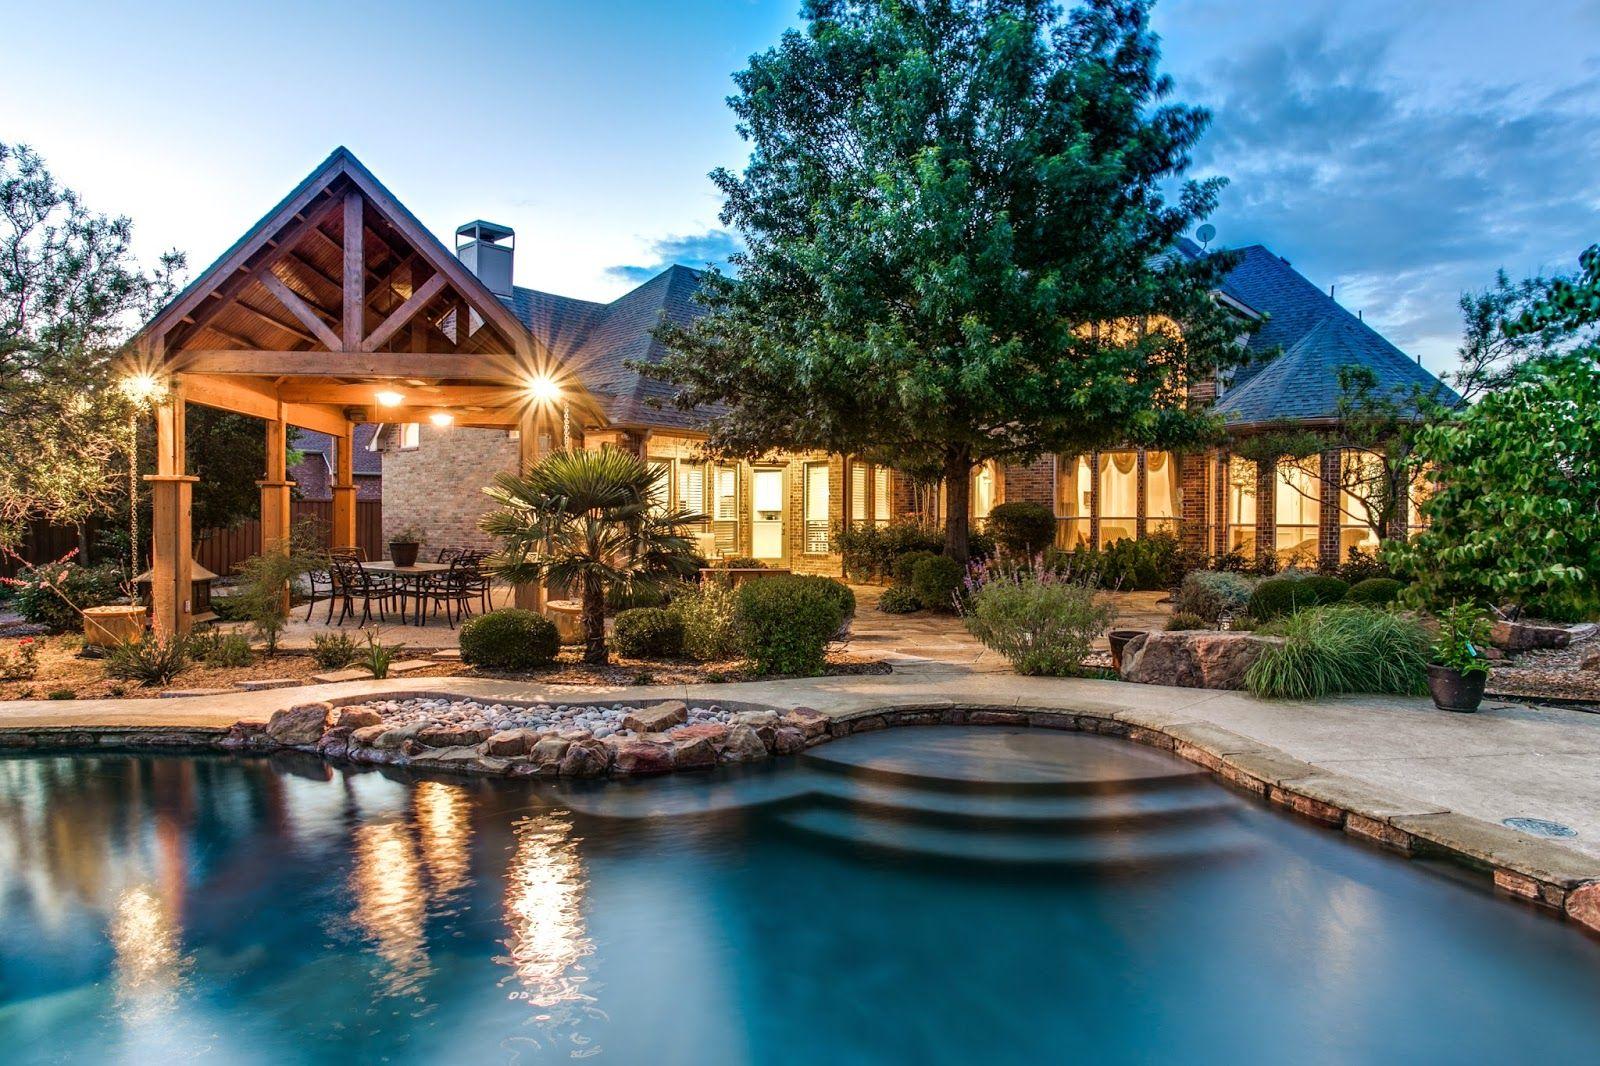 Backyard Paradise: Stunning Custom Home With A Pool And Backyard Paradise